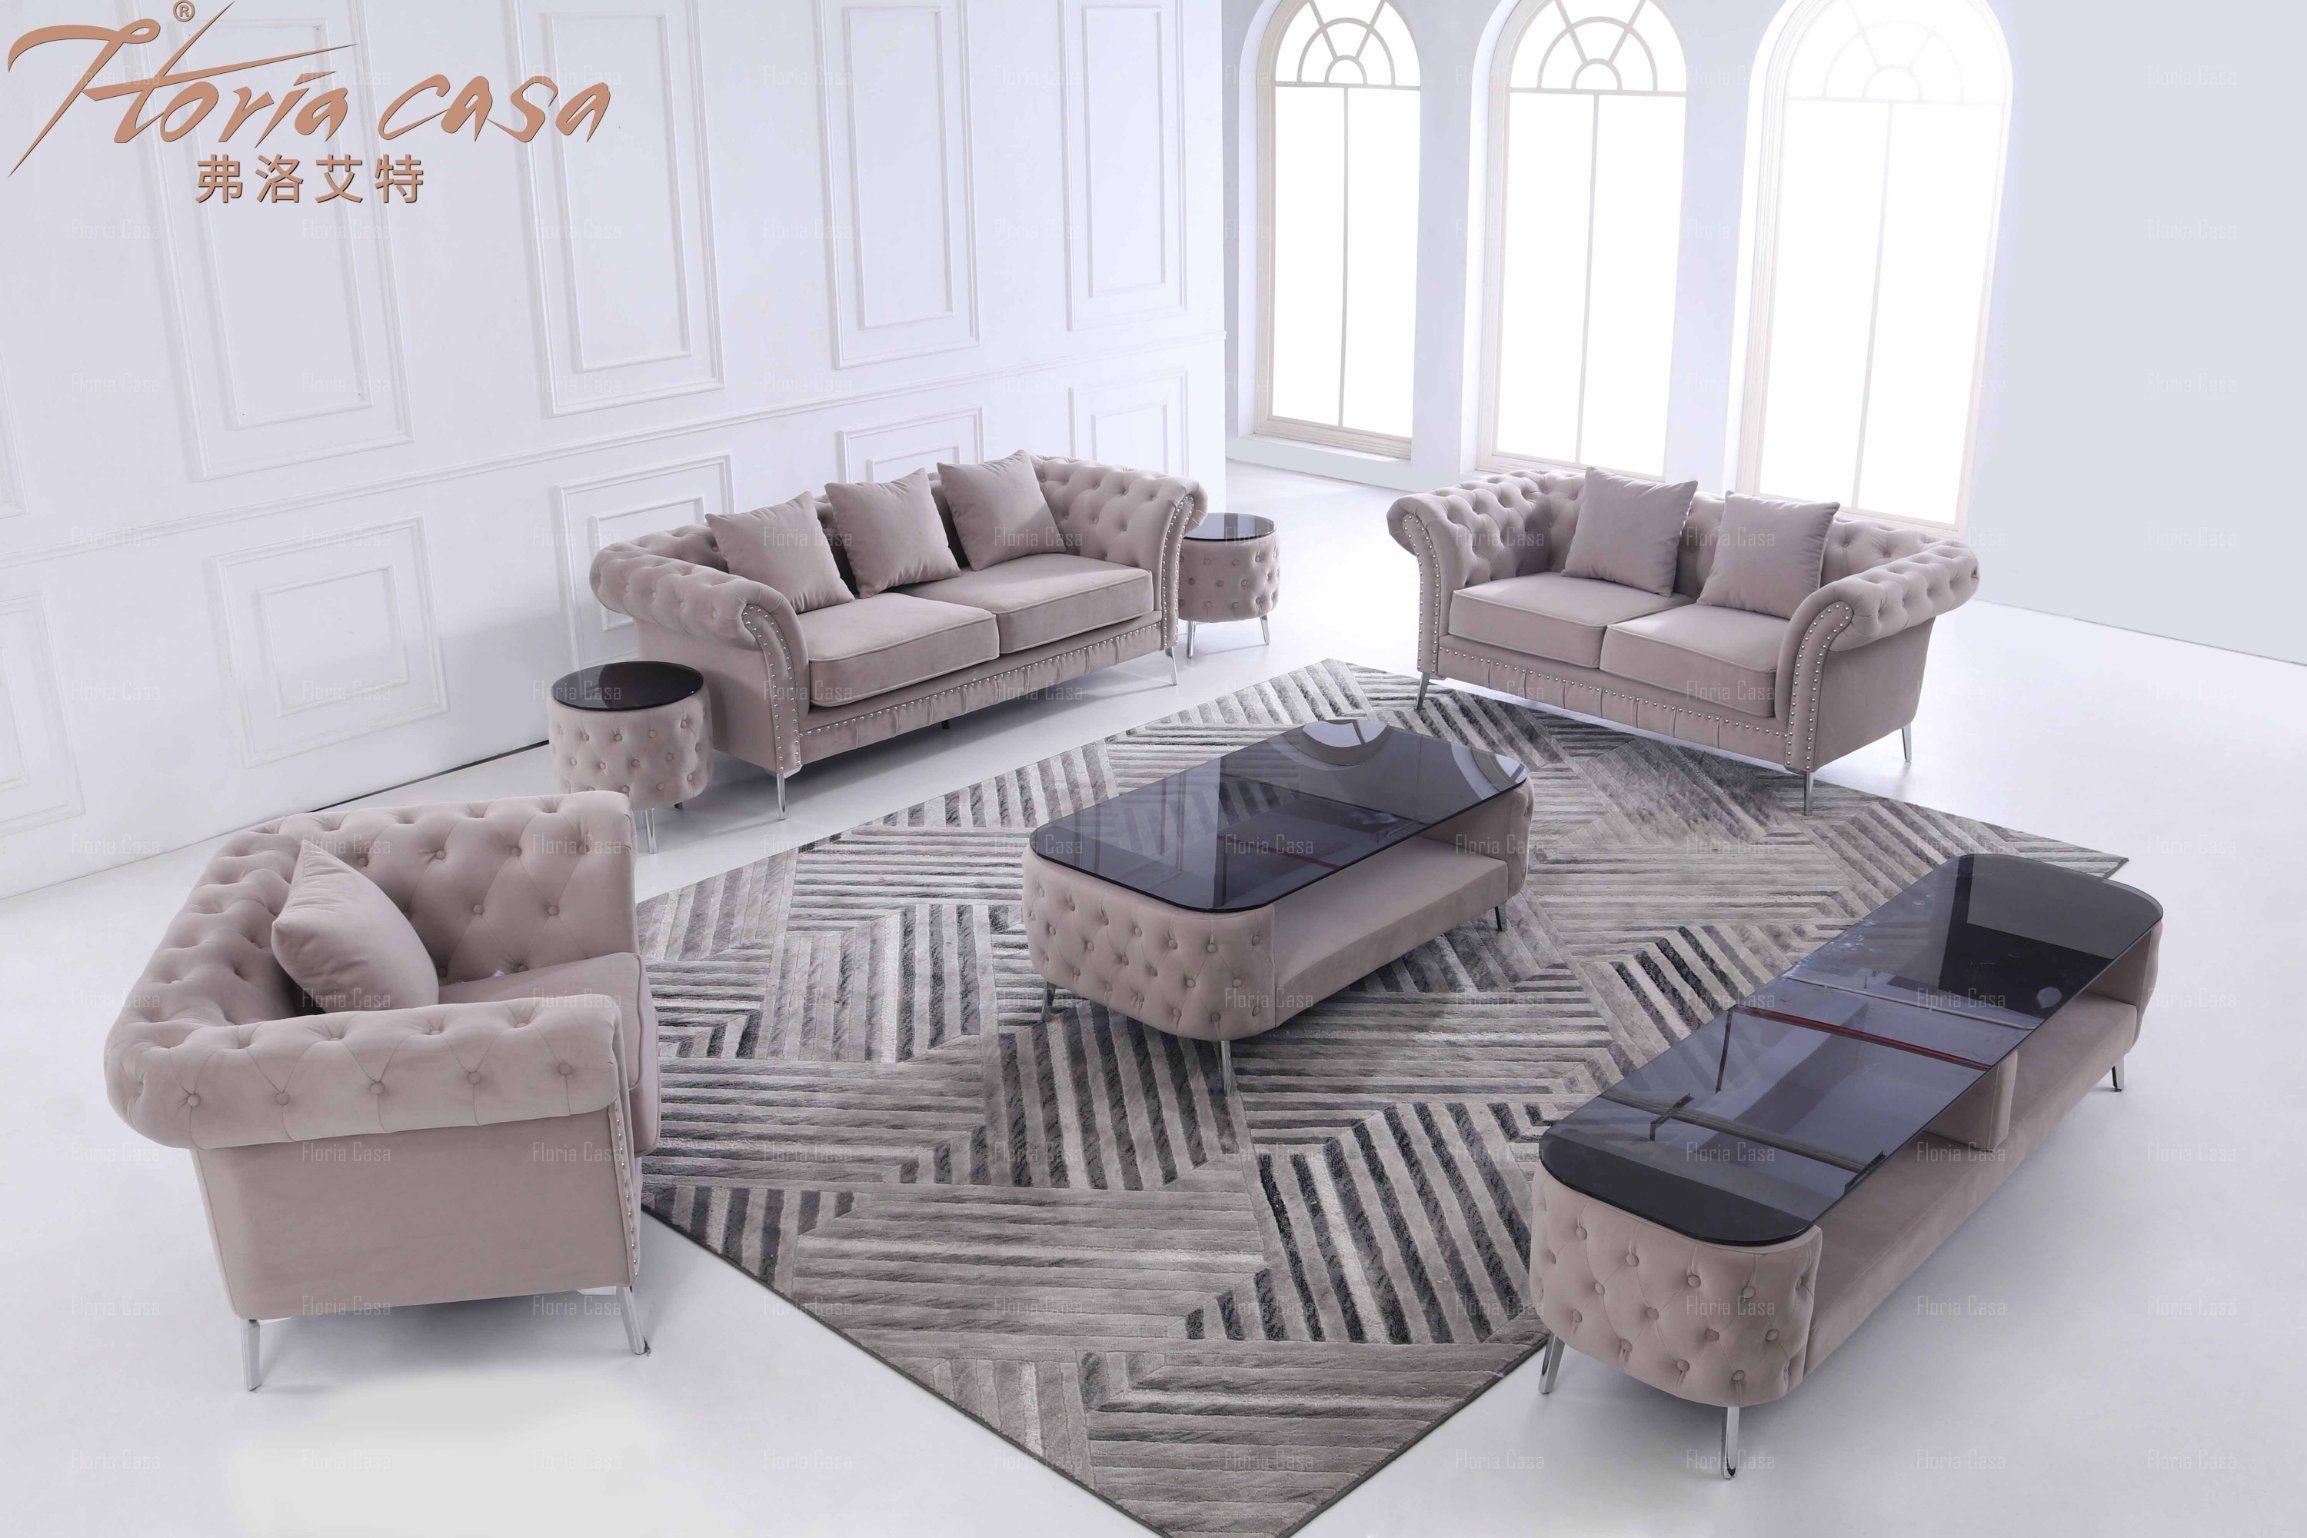 furniture sofa set with coffee table